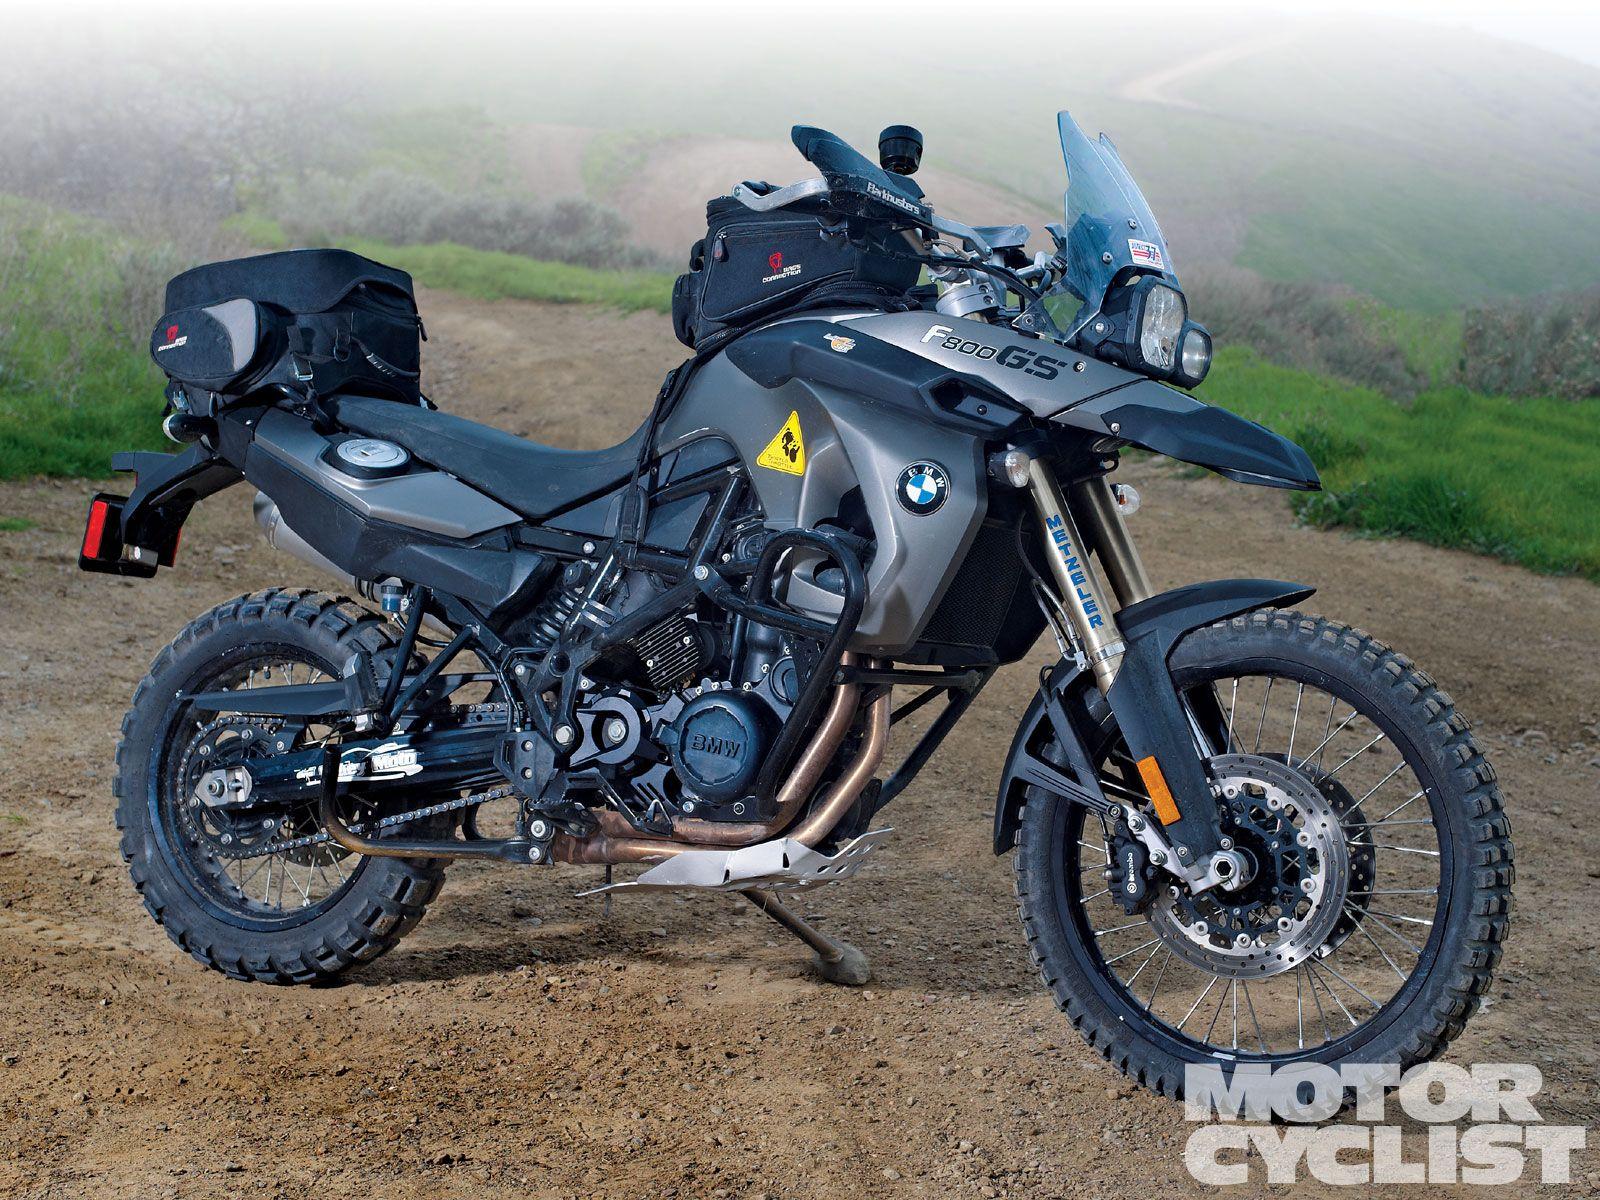 Pin By Marc Huot On Motorcycles Bike Bmw Motorcycle Bike Motorcycle